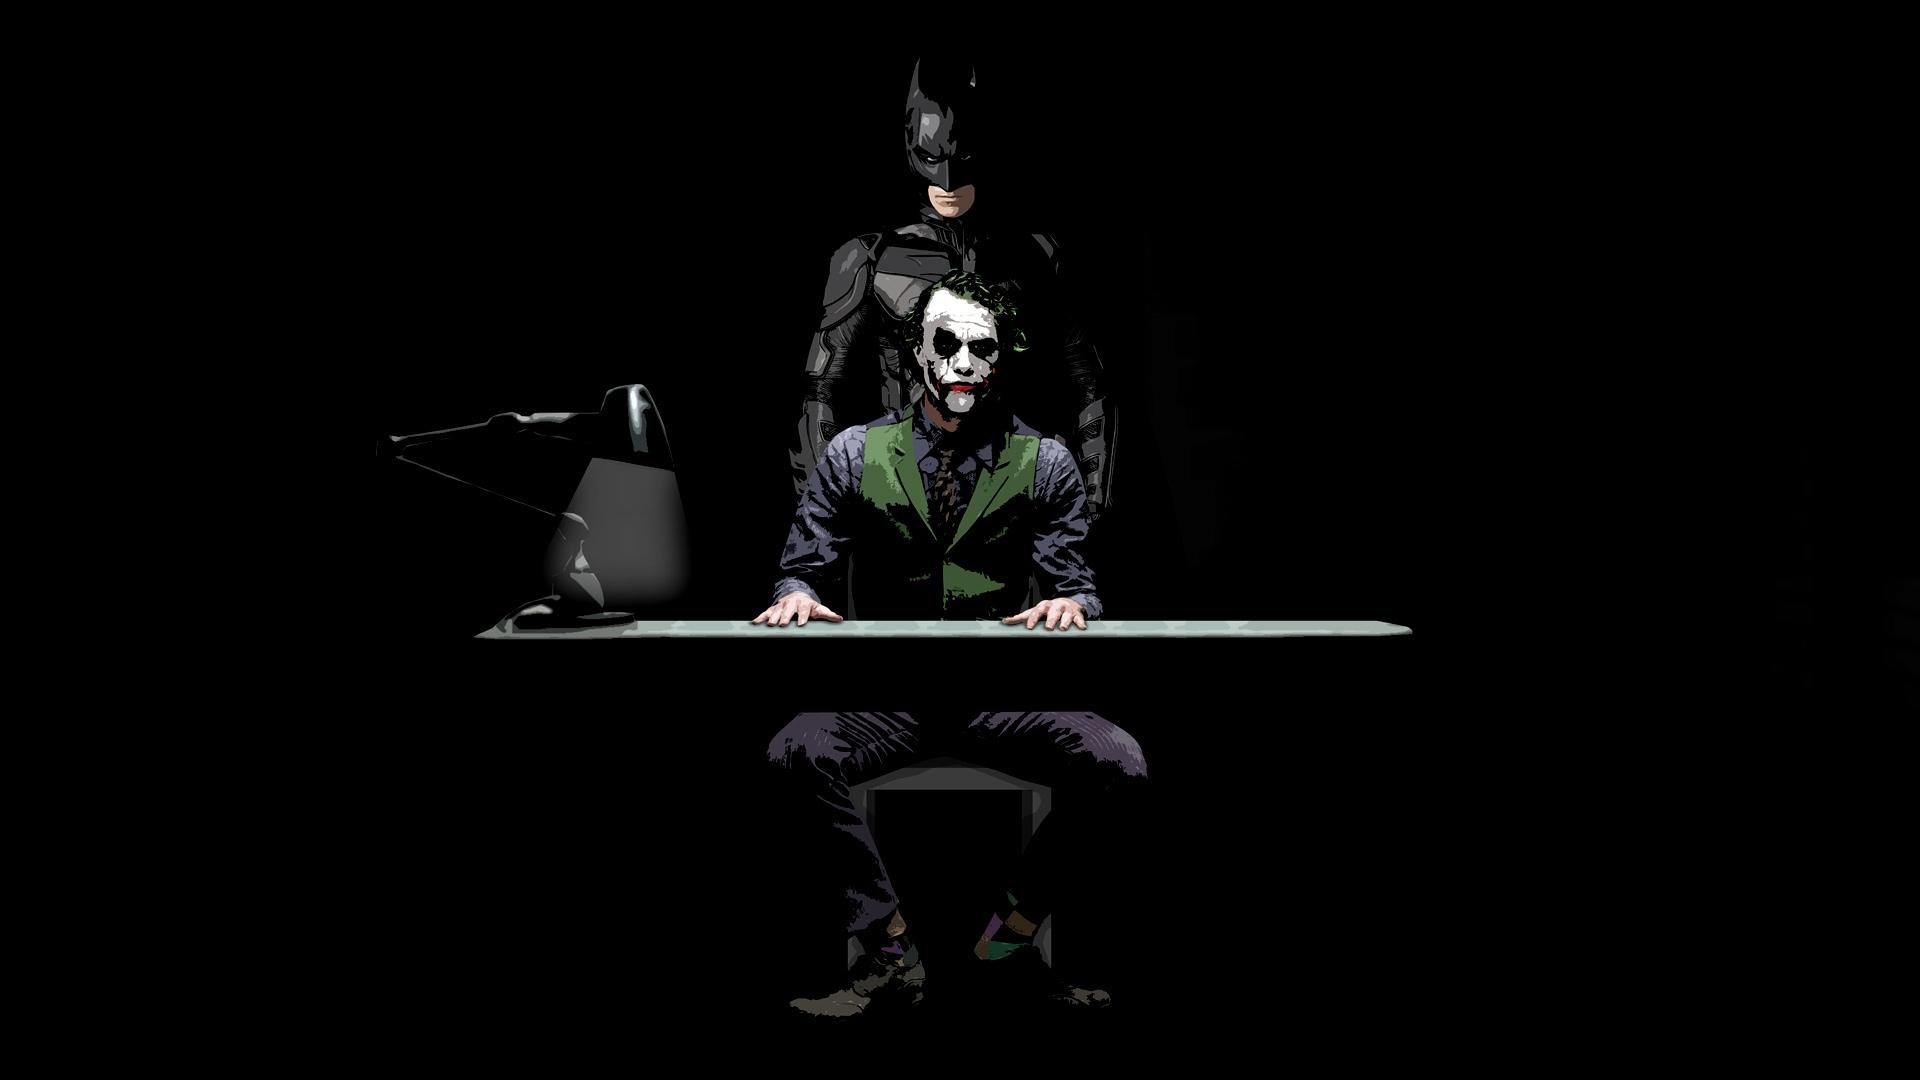 Download Wallpaper Joker Hd